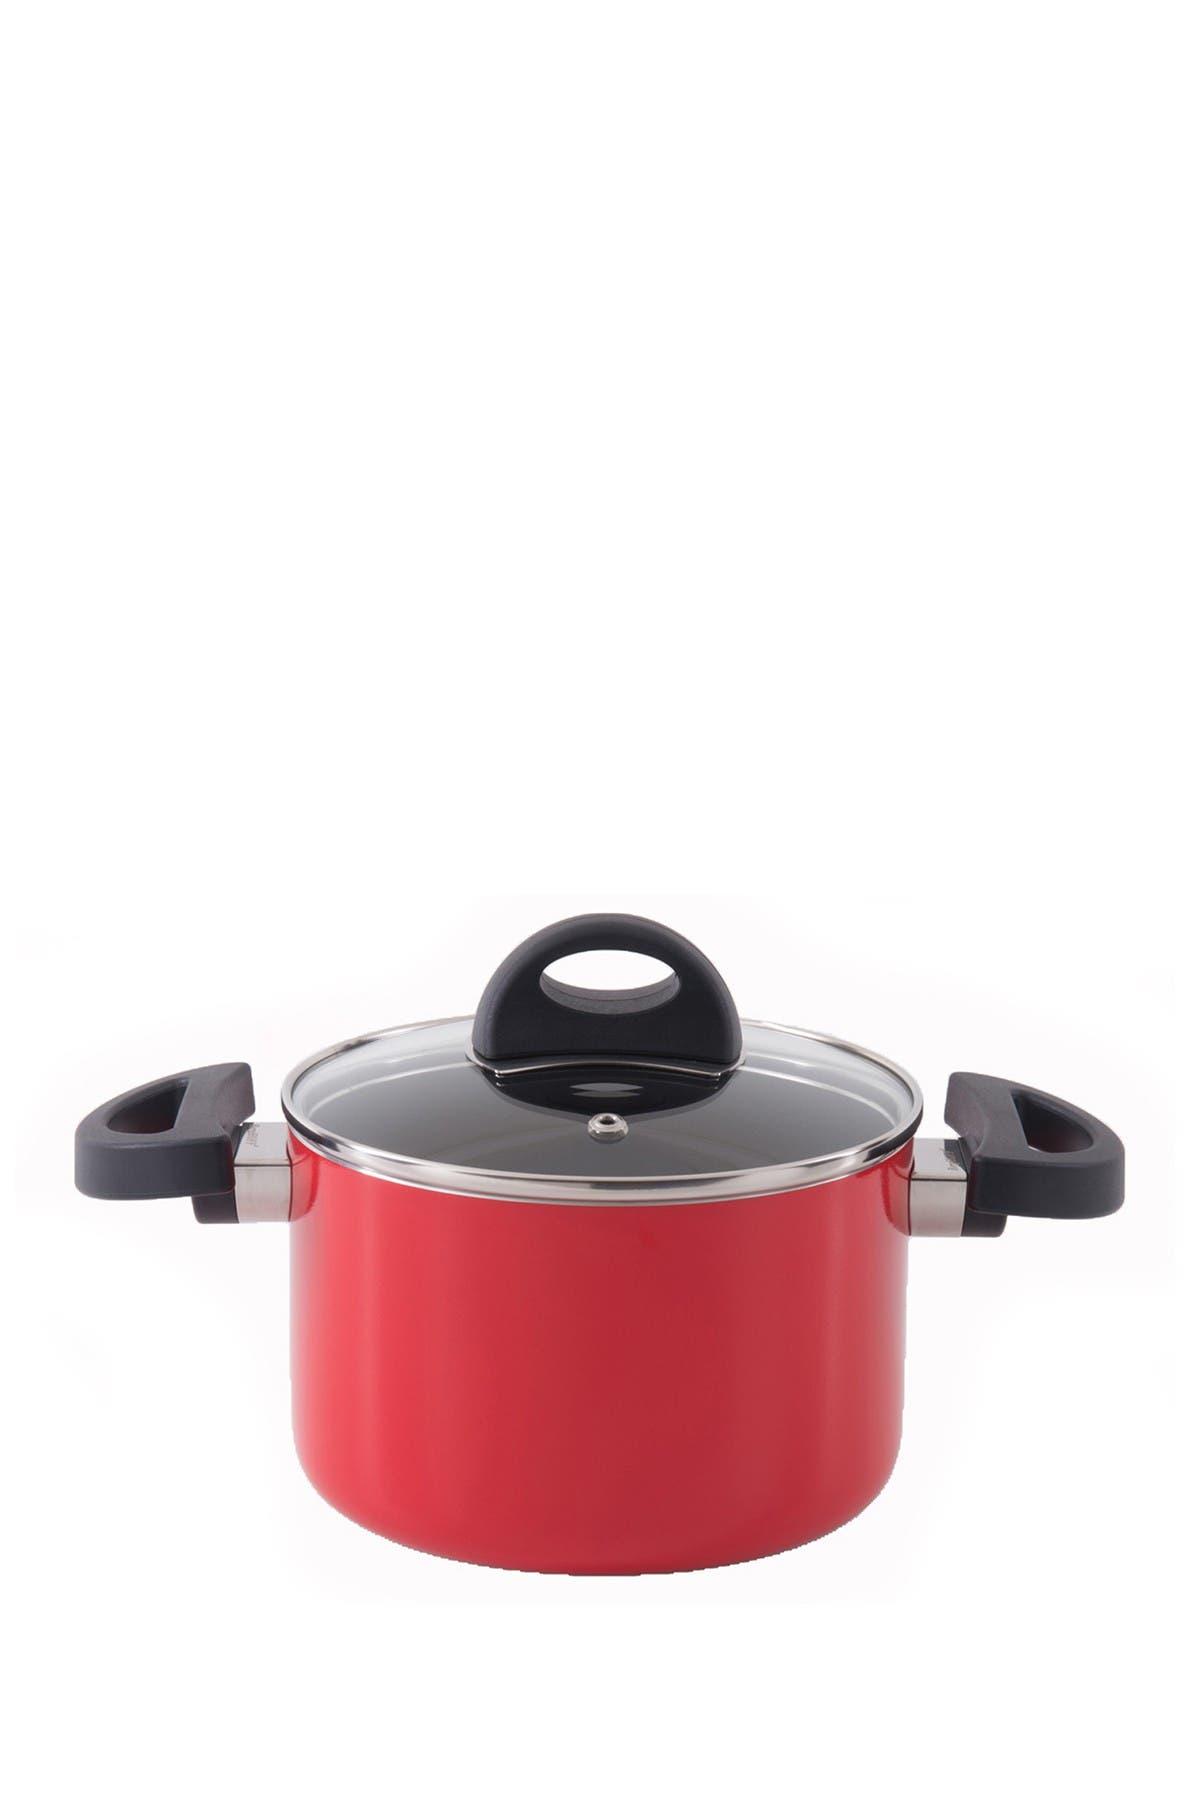 Image of BergHOFF Red 2.1 qt. Aluminum Covered Casserole Pot